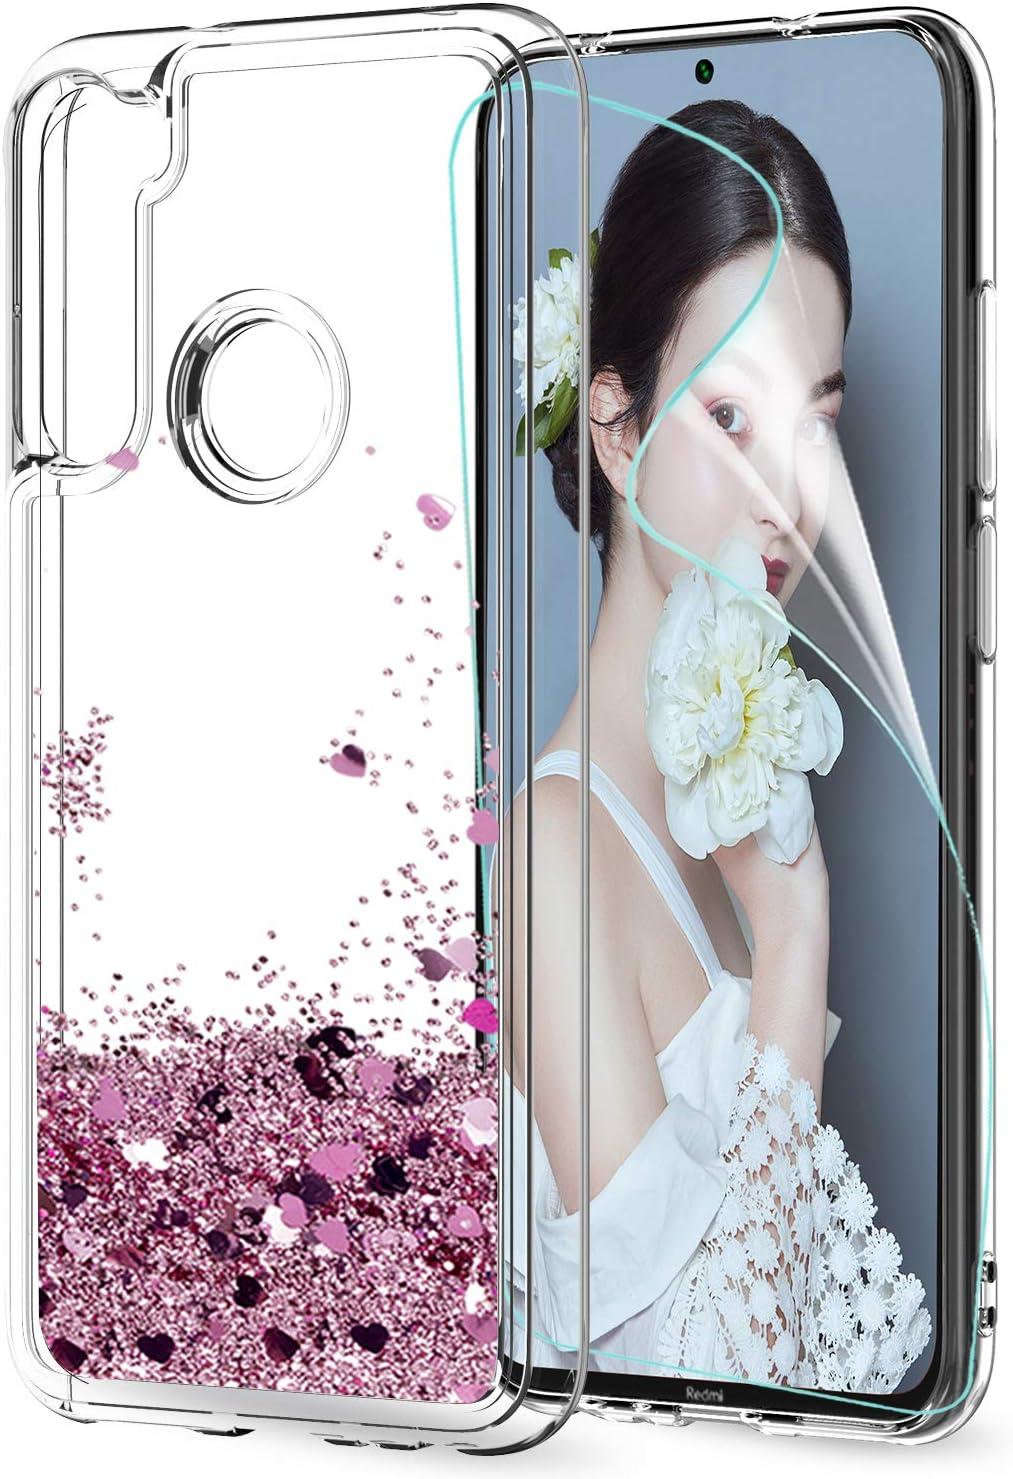 LeYi Funda Xiaomi Redmi Note 8 Silicona Purpurina Carcasa con HD Protectores de Pantalla, Transparente Cristal Bumper Telefono Gel TPU Fundas Case Cover para Movil Redmi Note 8 ZX Oro Rosa